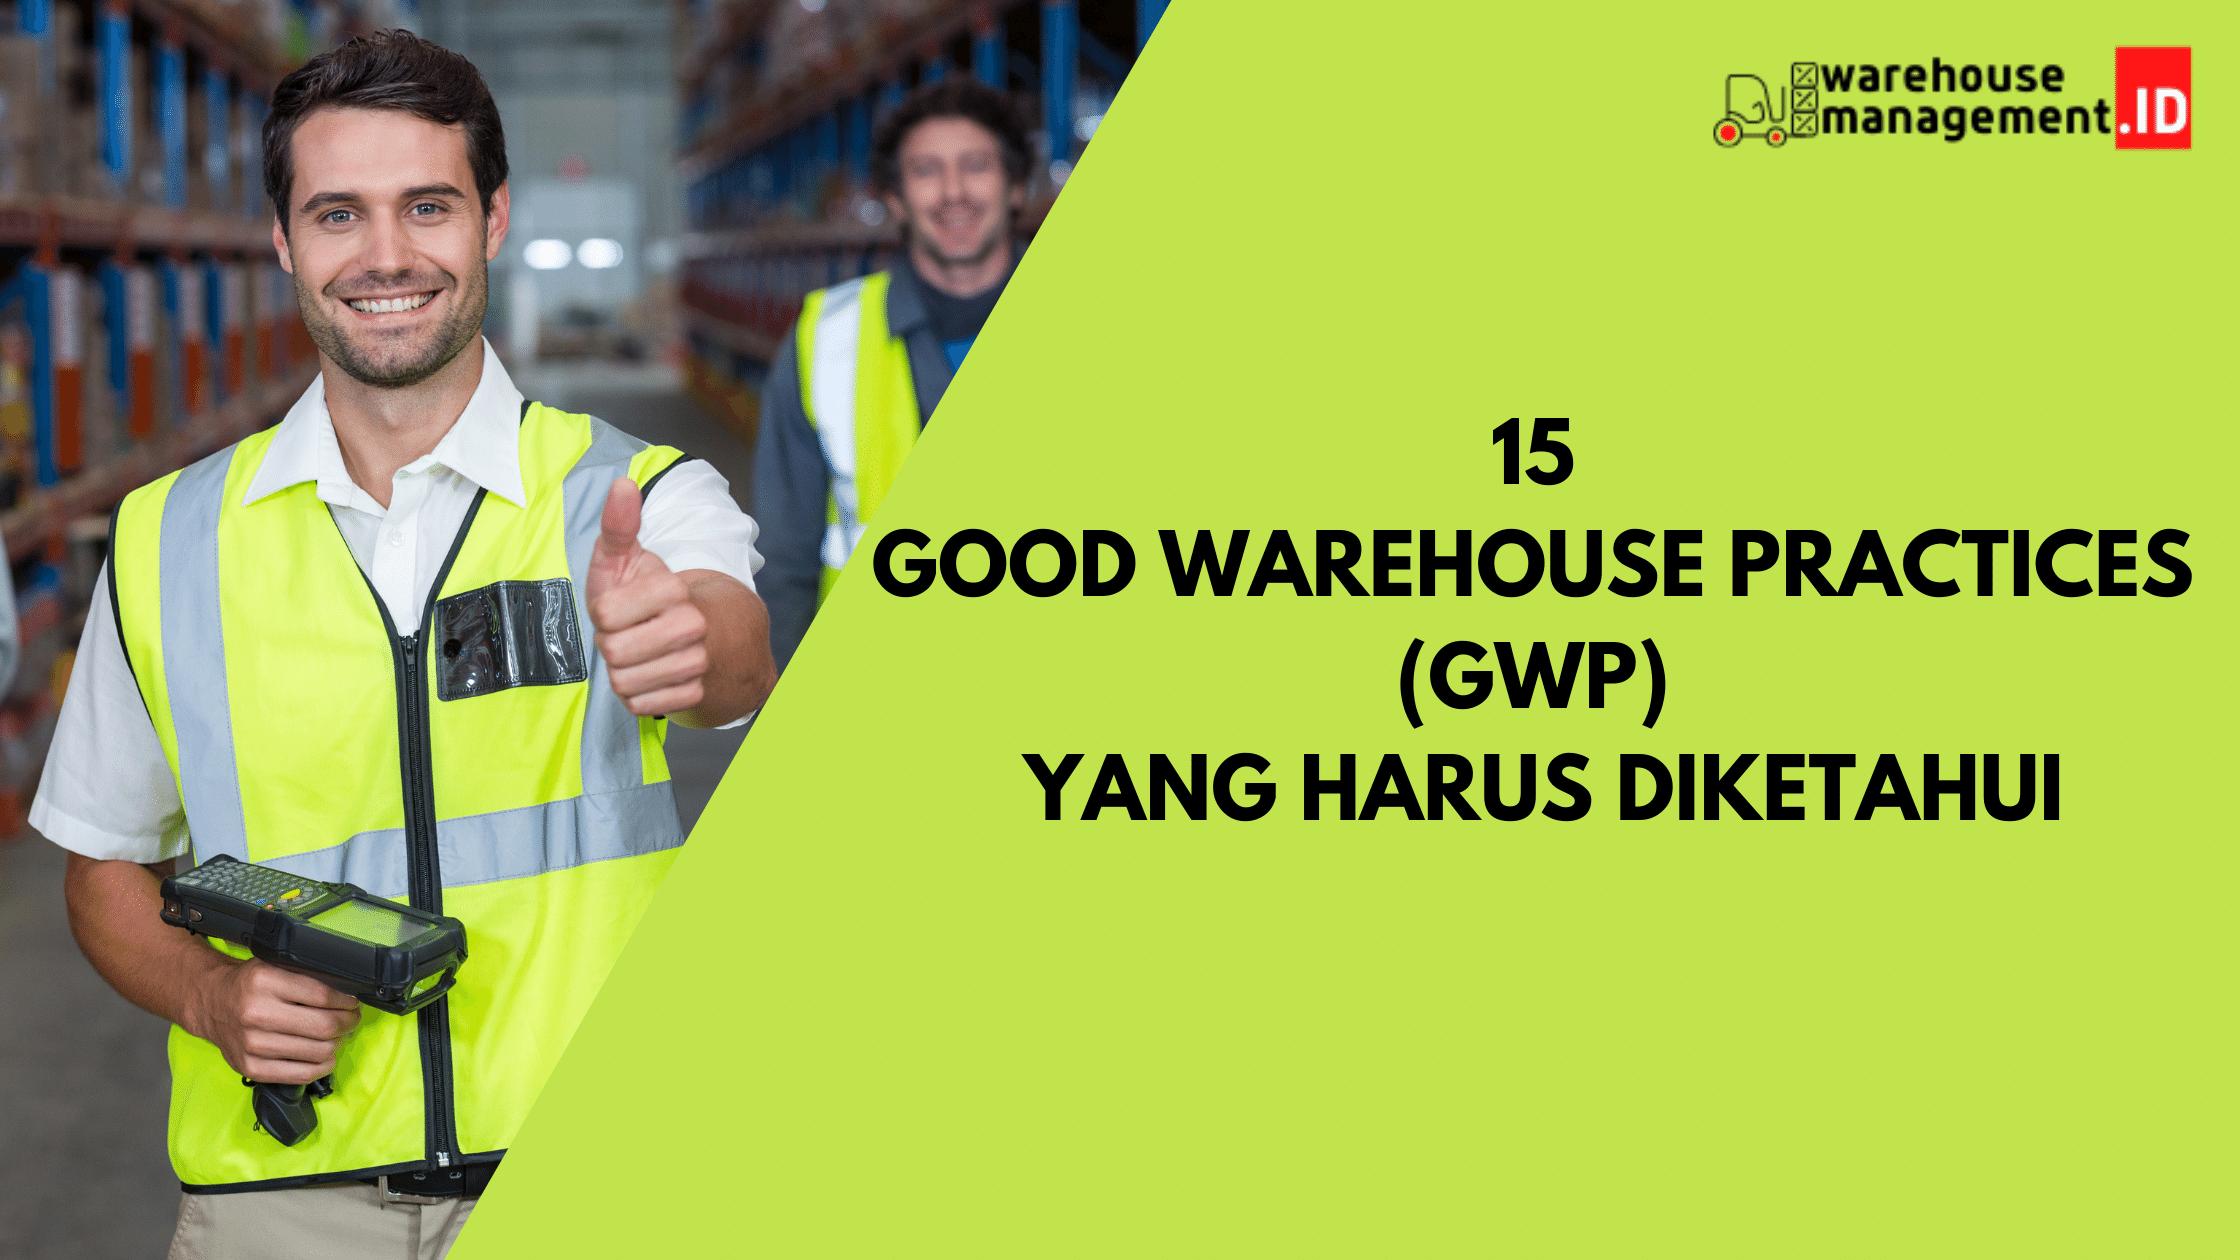 15 Good Warehouse Practices (GWP) Yang Harus Diketahui